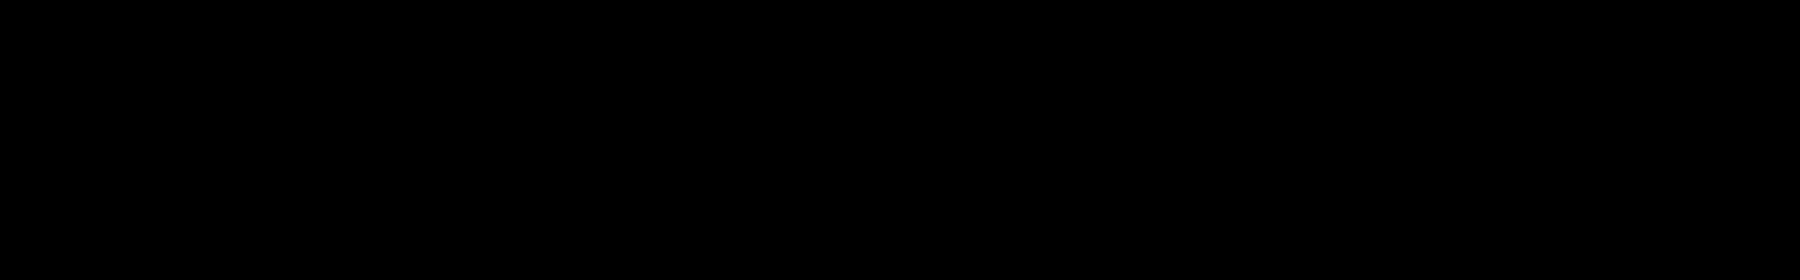 SOUL-FI audio waveform